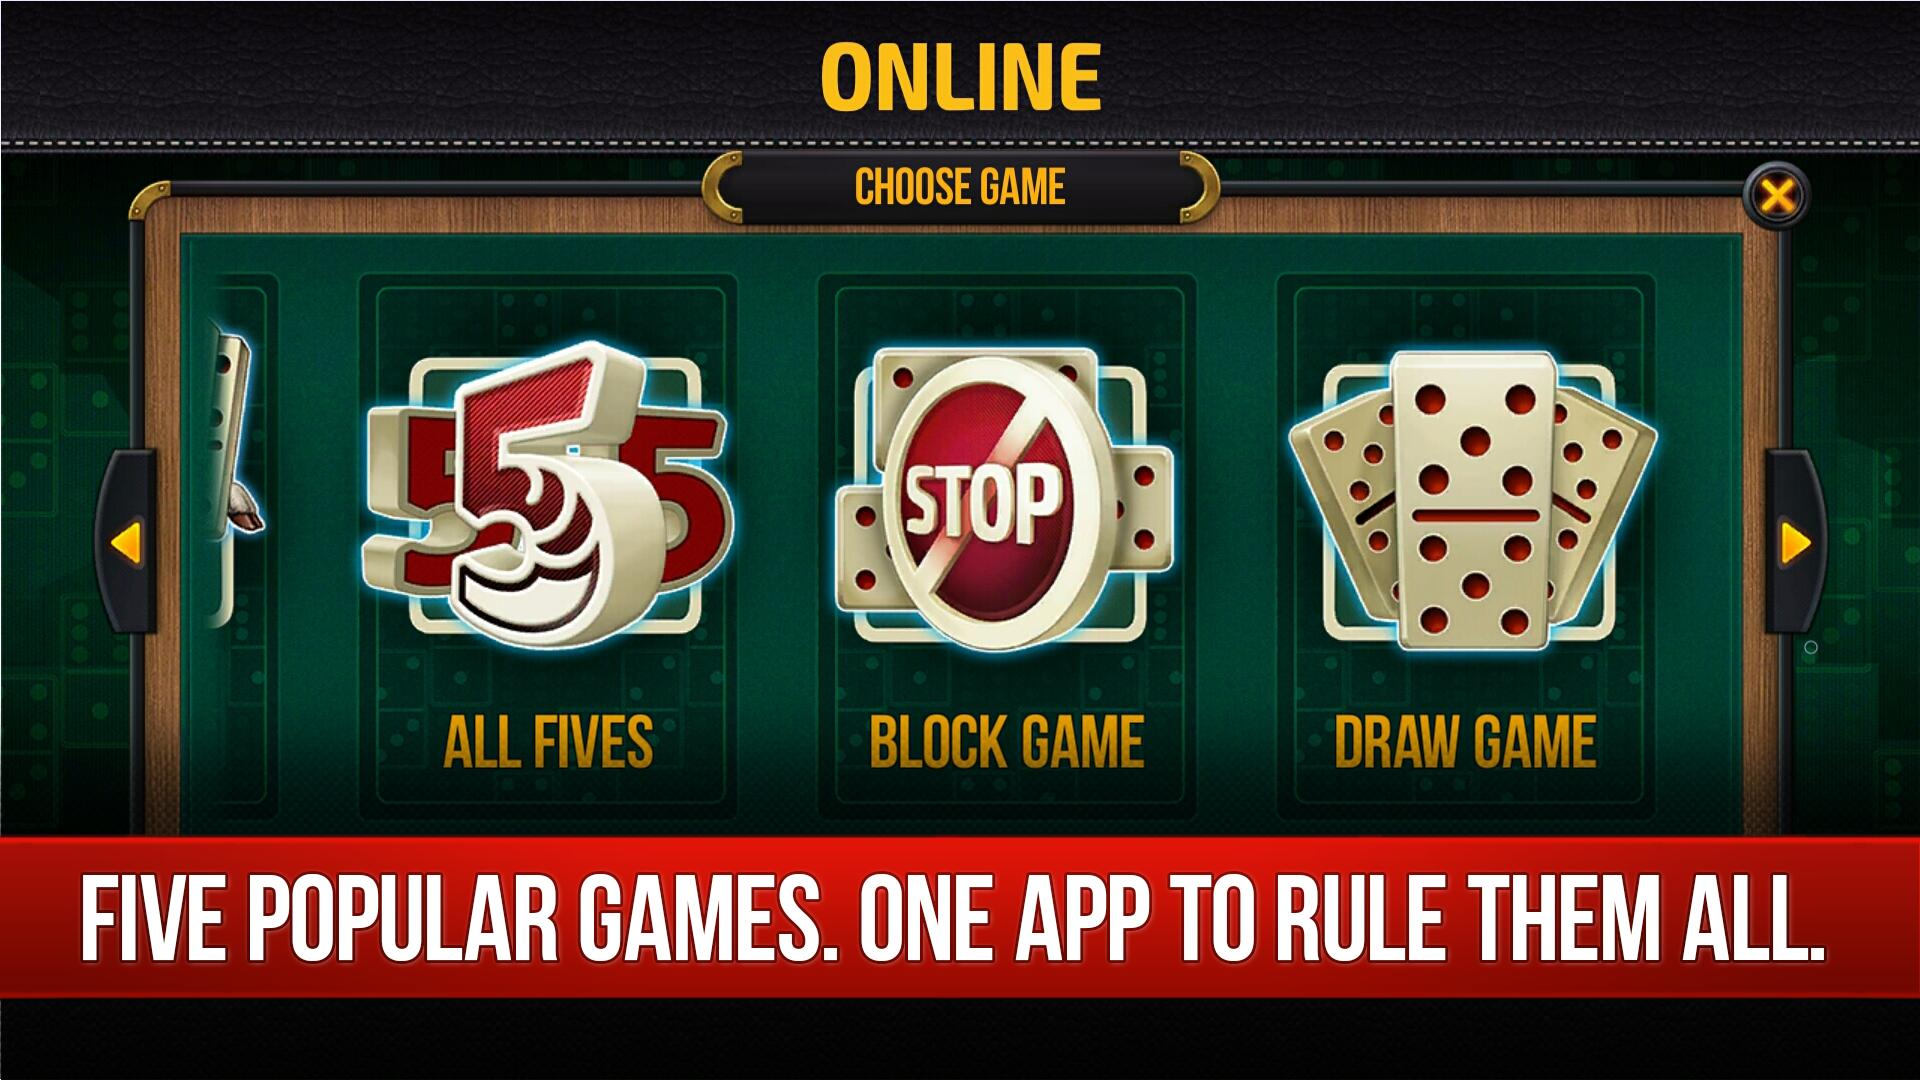 Domino - Dominoes online. Play free Dominos! 2.9.2 Screenshot 2